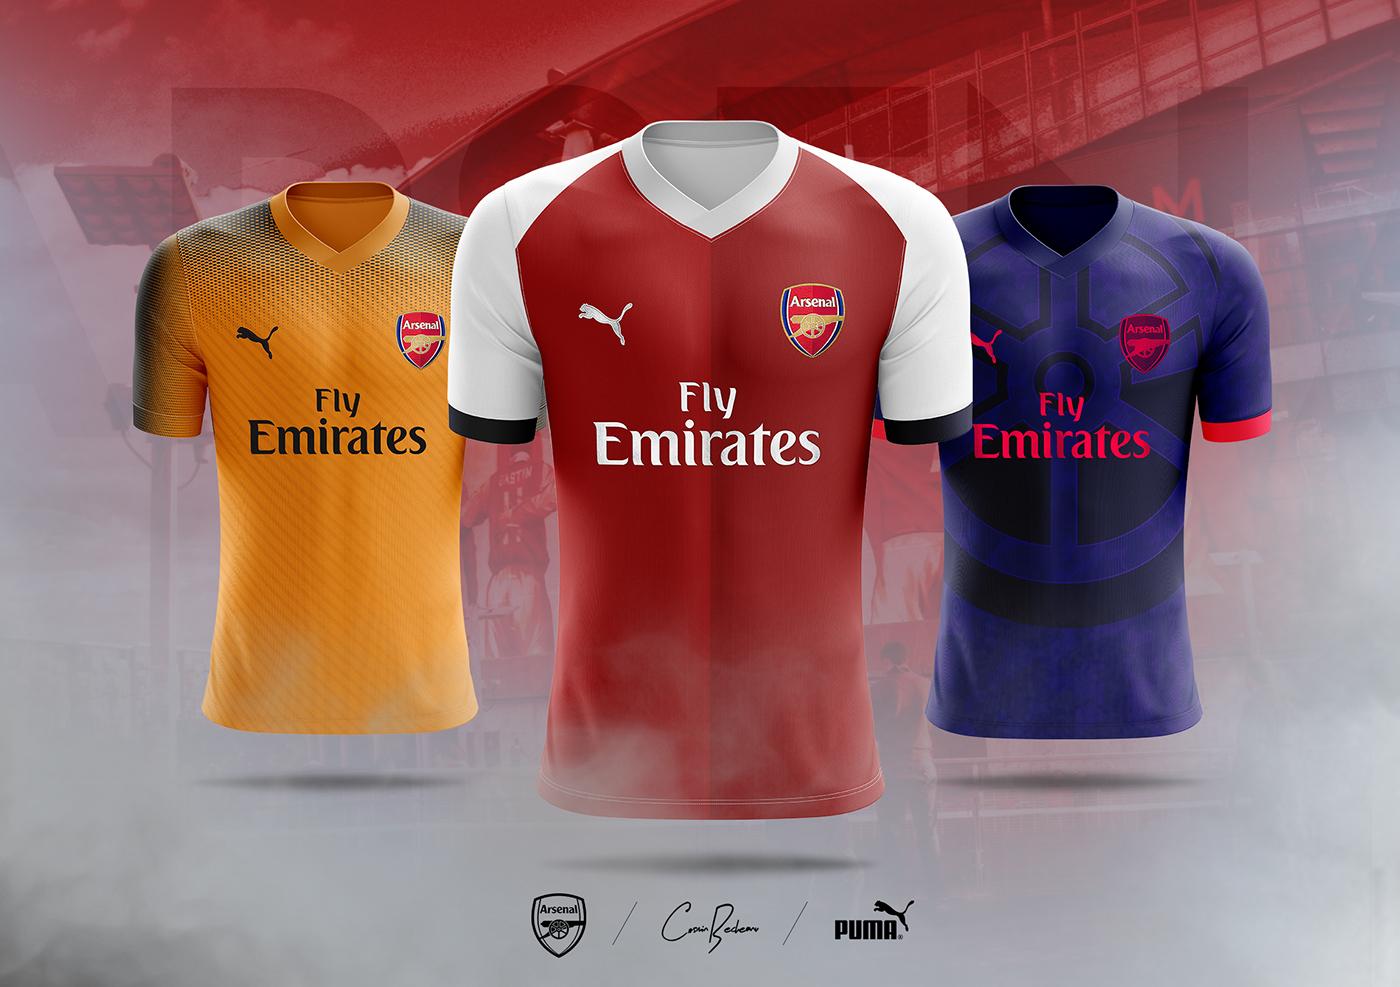 low priced 38fd5 2c105 Arsenal FC - PUMA - Concept 2019 on Behance